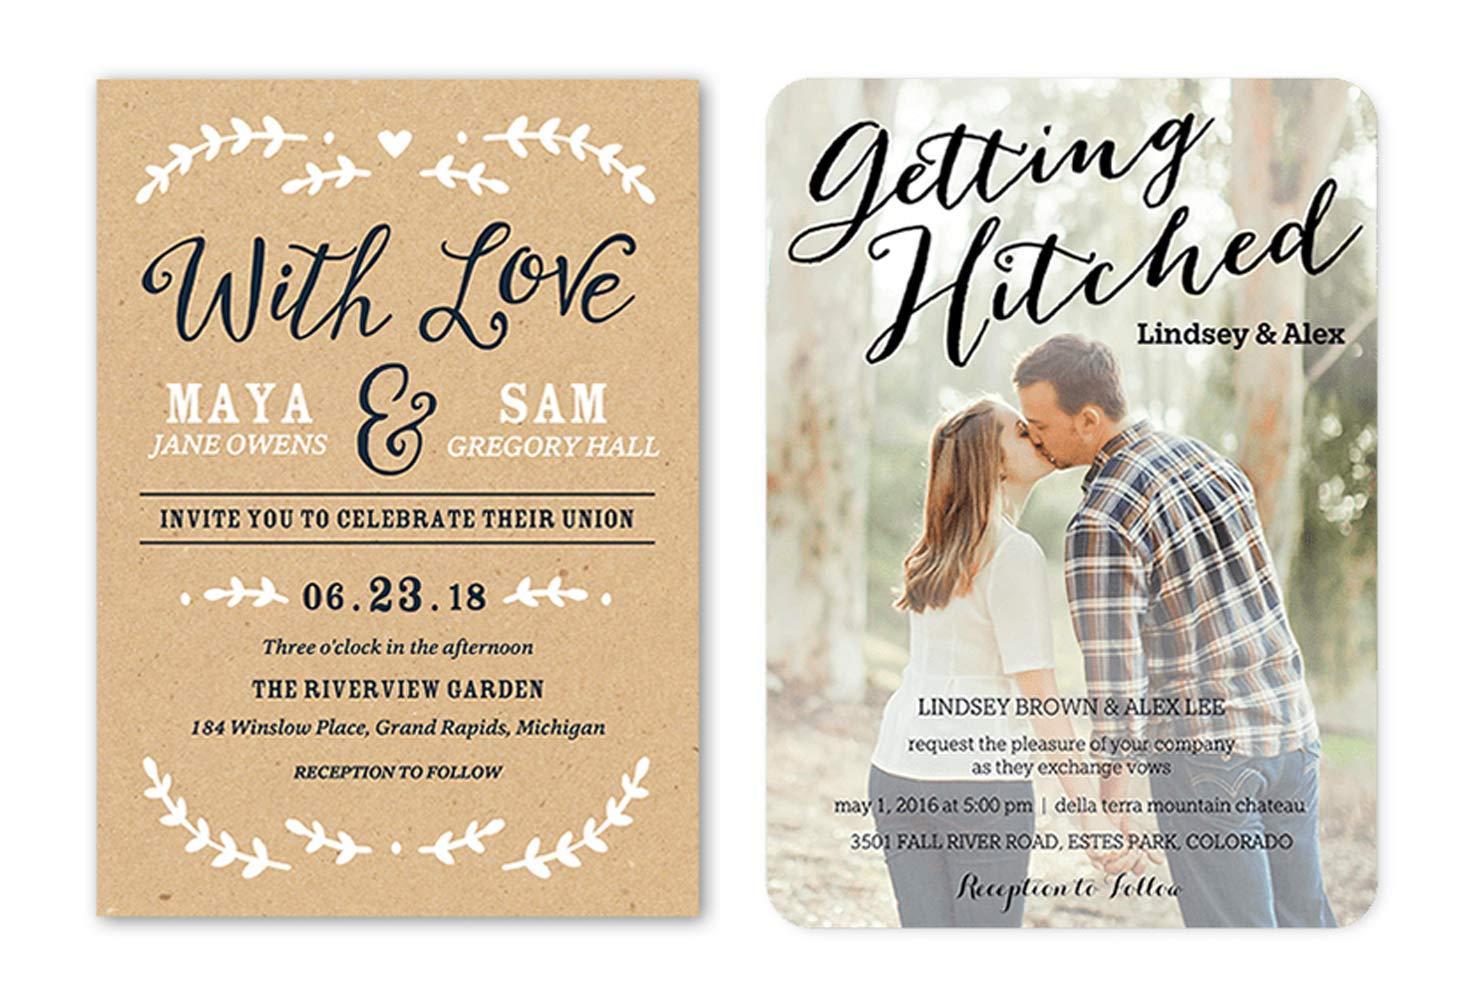 Marriage Invitation Sample